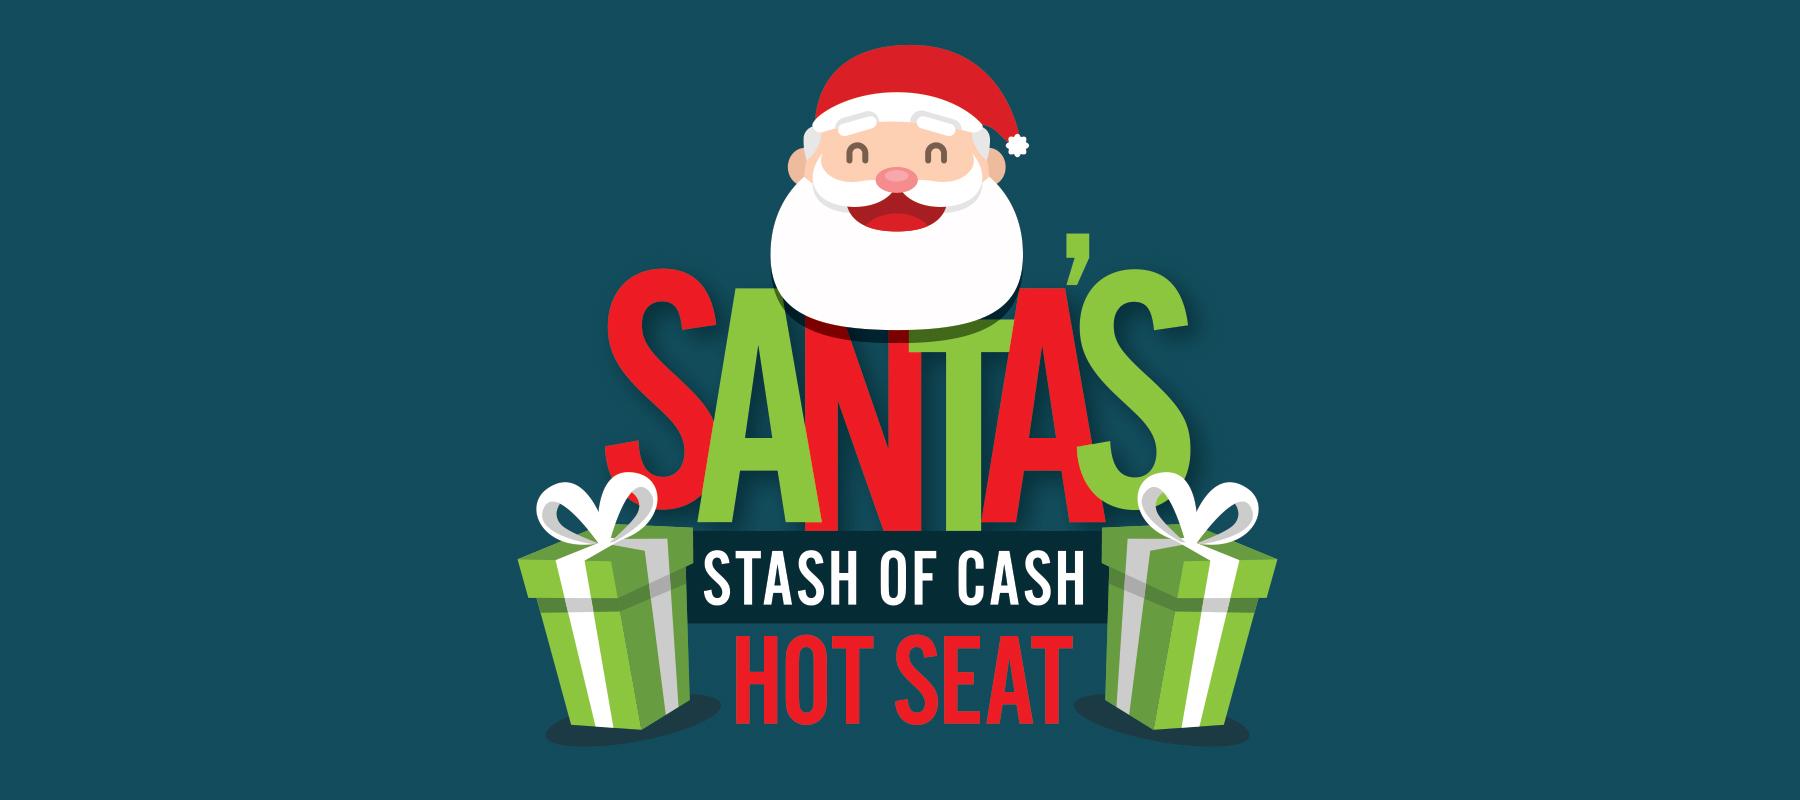 Santa's Stash of Cash Hot Seat